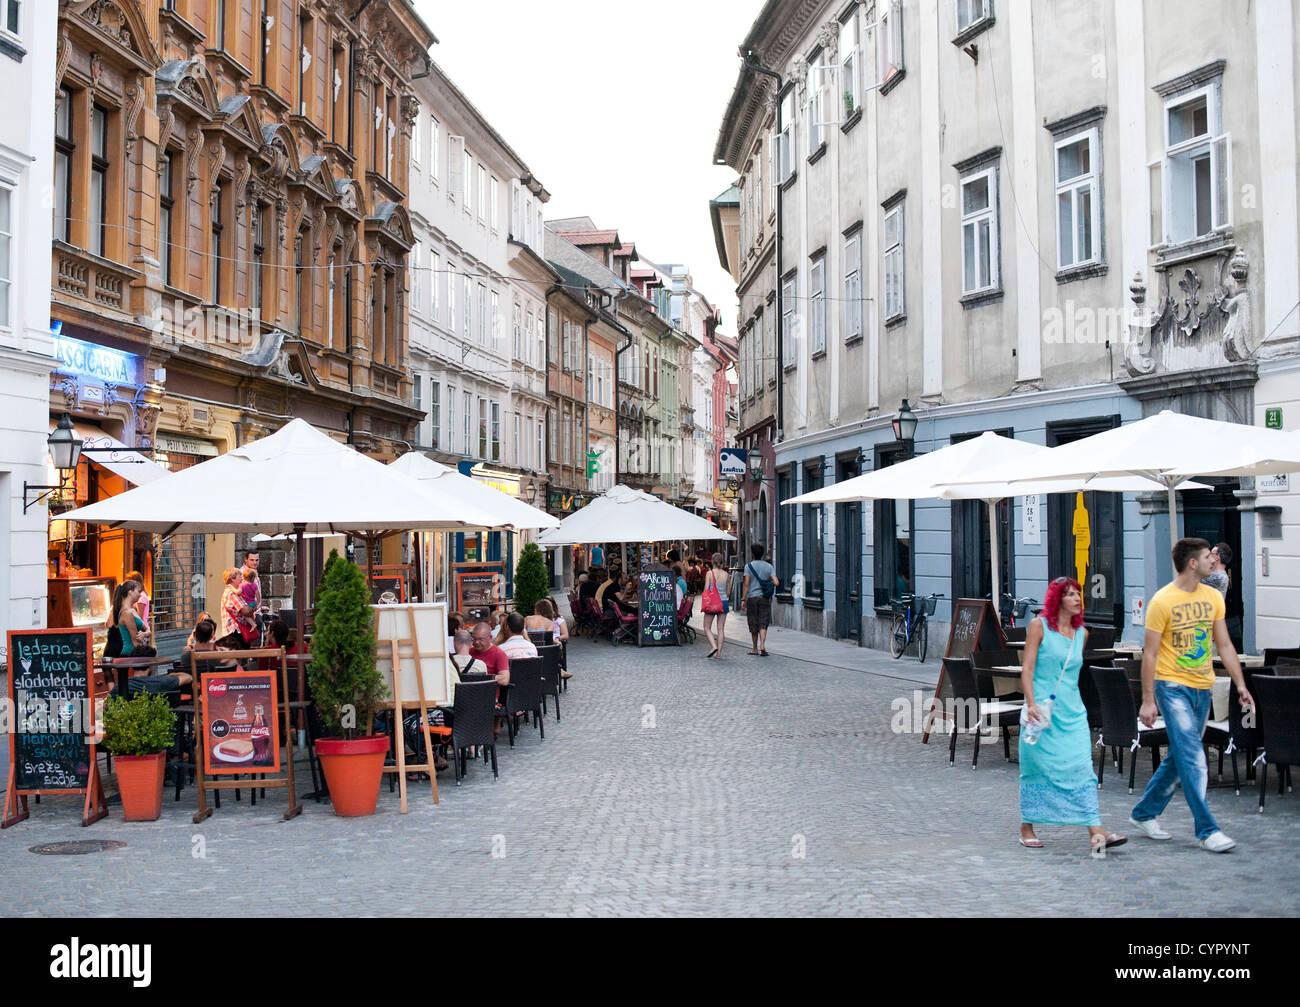 Sidewalk cafes in the old town in Ljubljana, the capital of Slovenia. - Stock Image